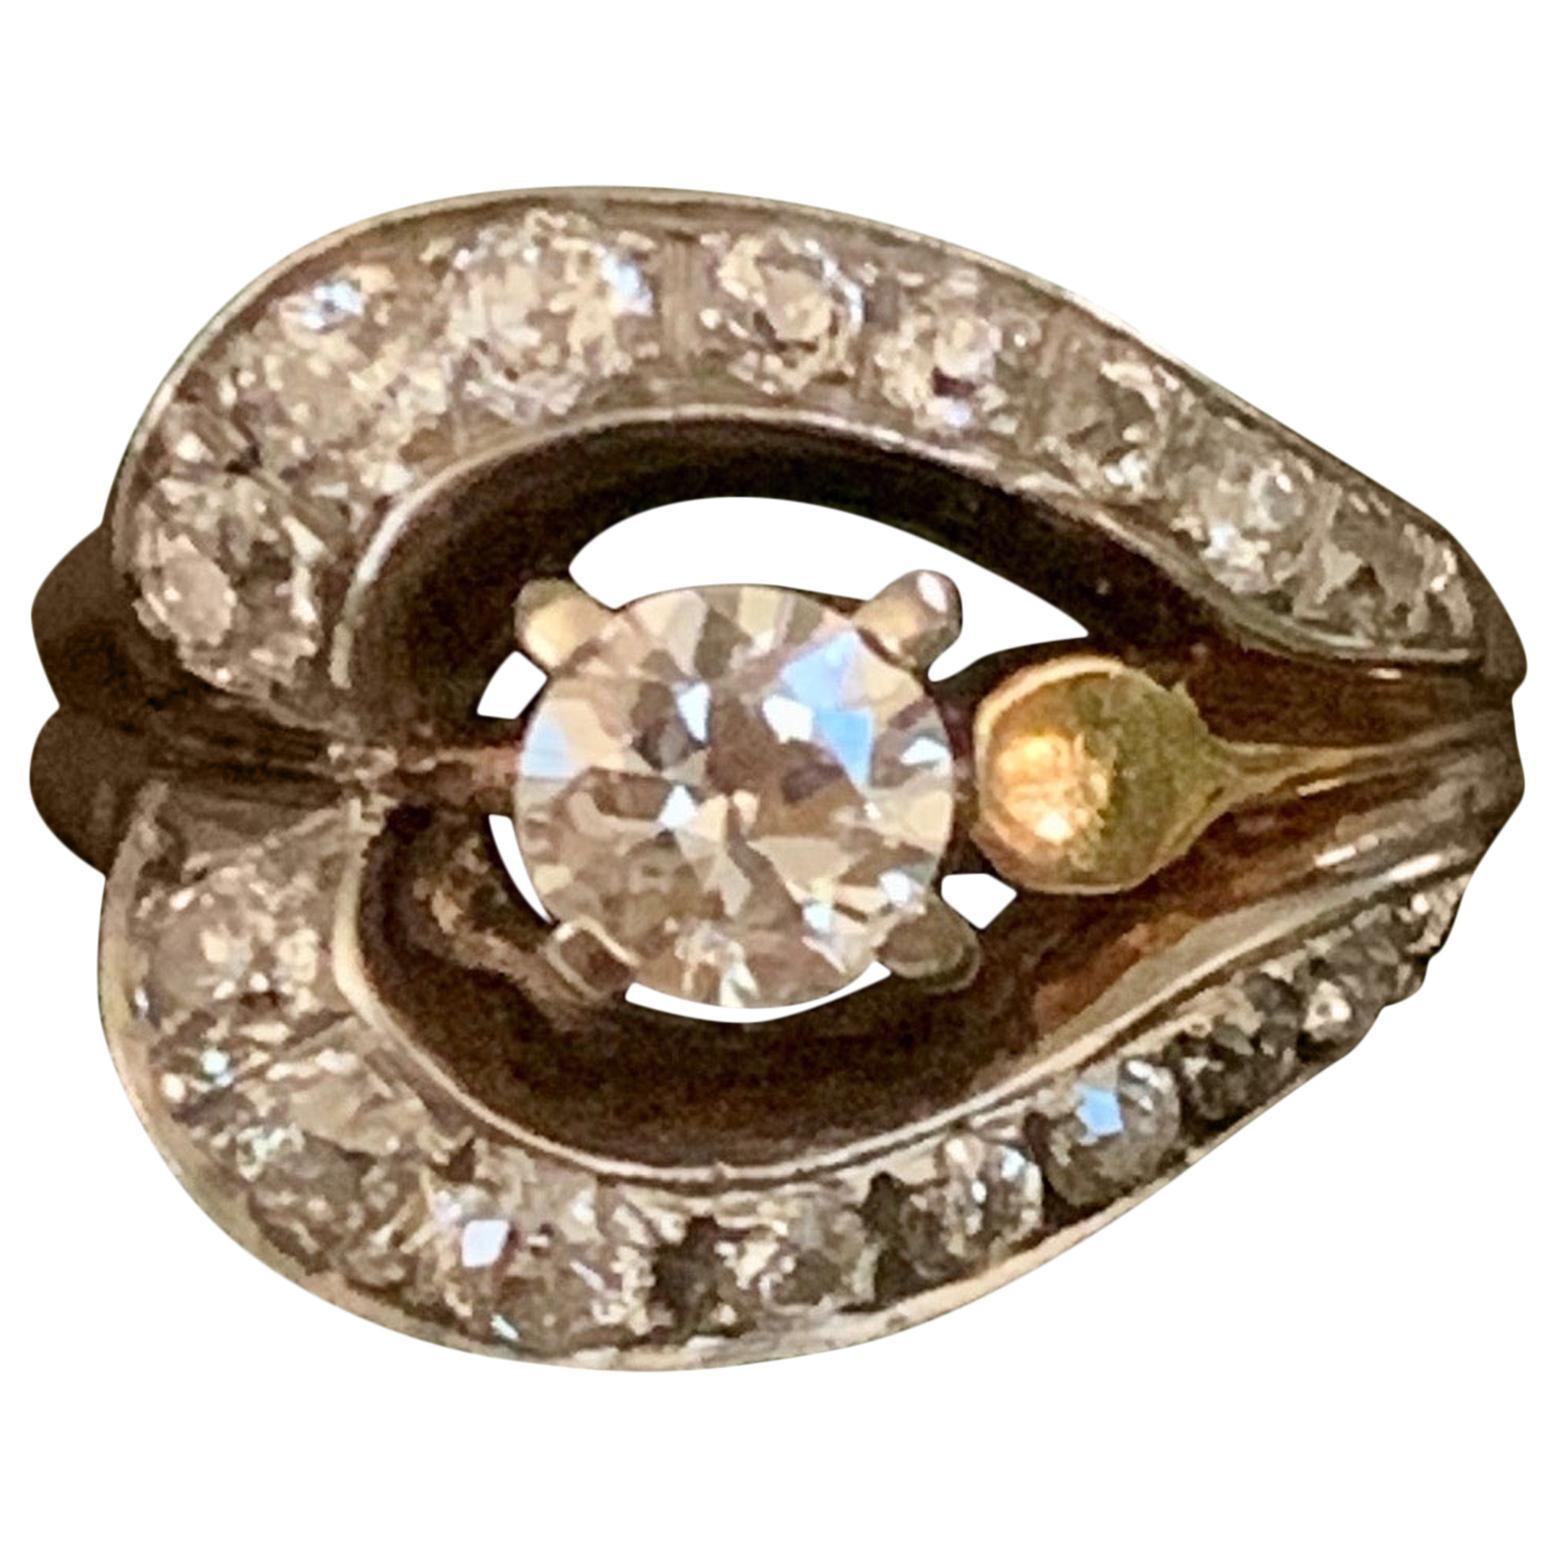 Vintage Euro Cut Diamond 14 Karat Yellow Gold Fashion Ring - Size 7